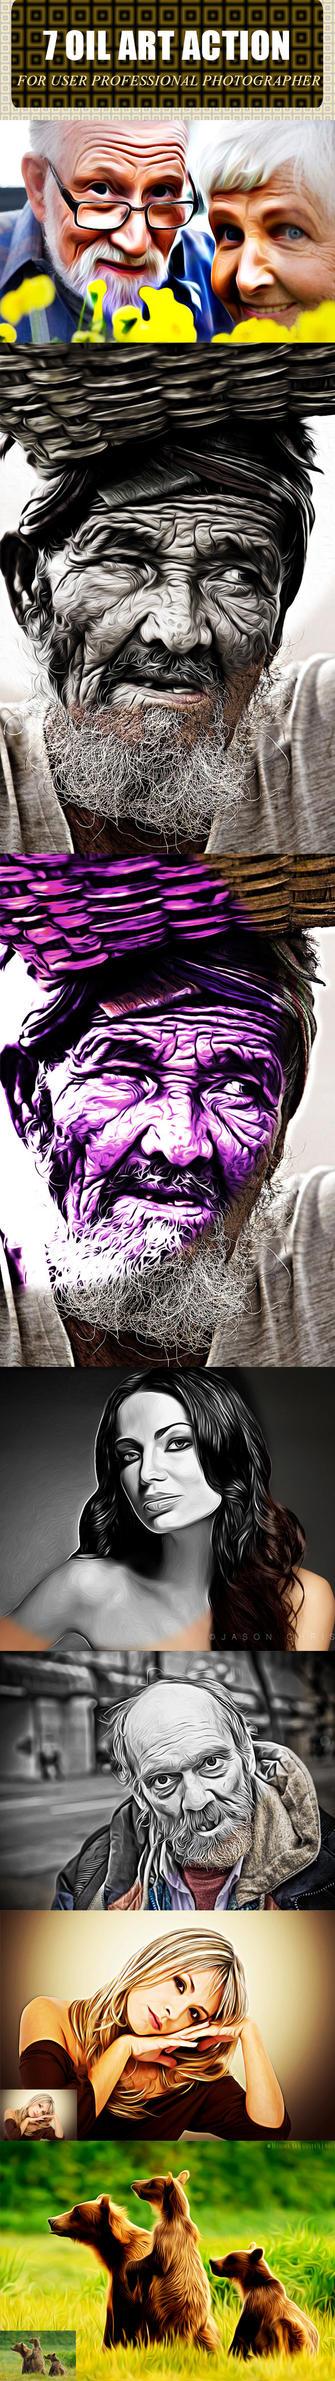 7 Oil Art Action by SelenaParker